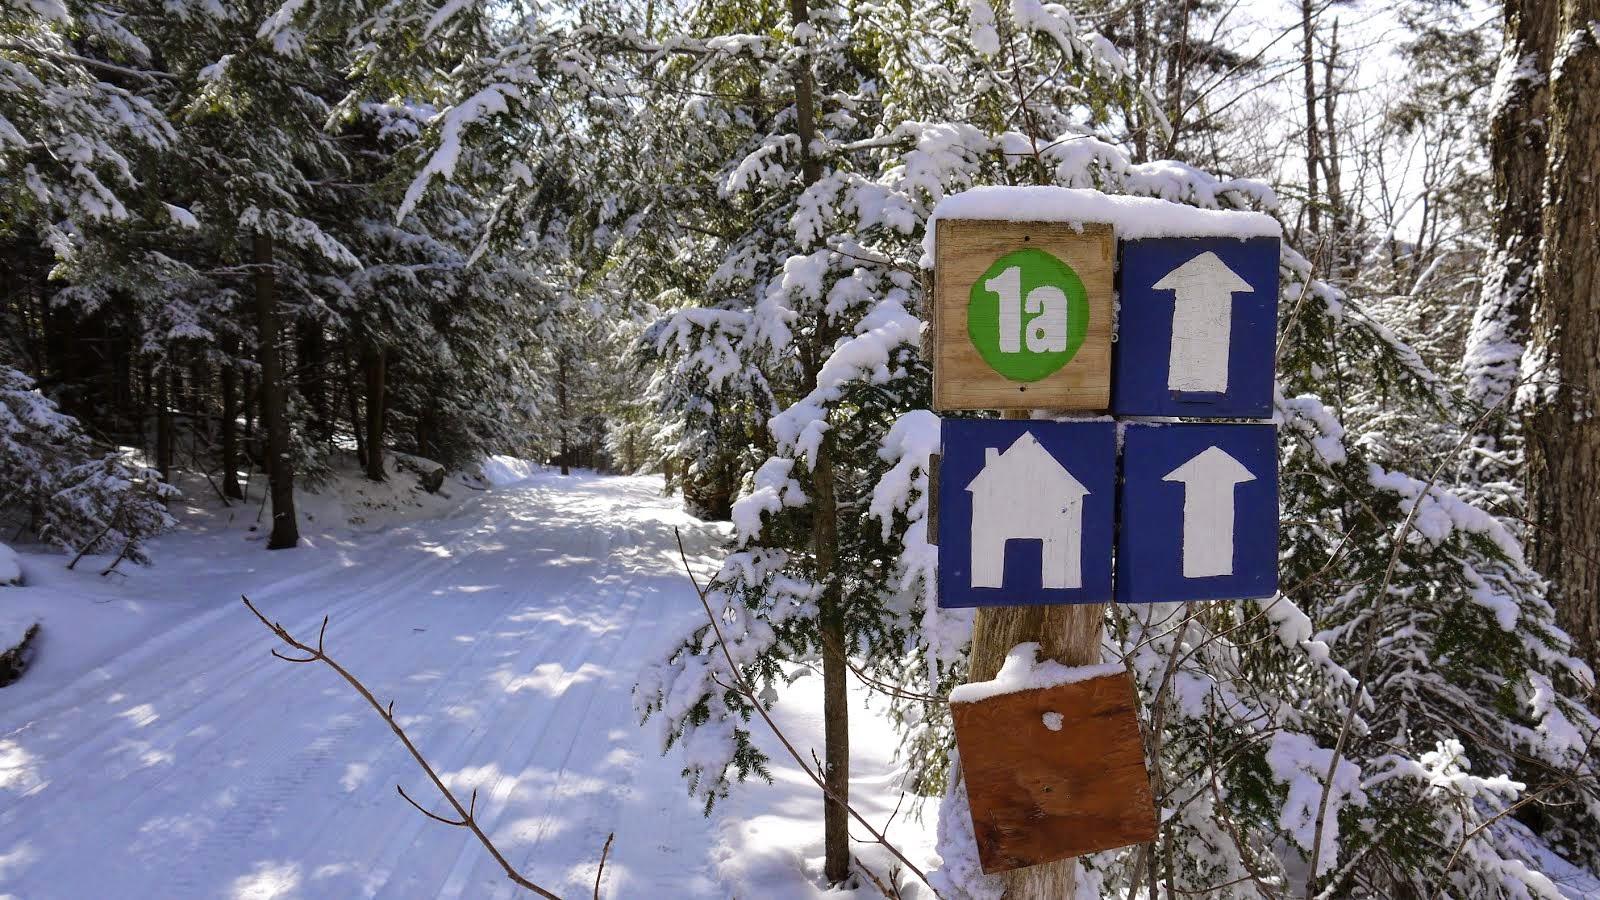 Ski classique, Ski nordique, Randonnée, Fatbike, Refuge